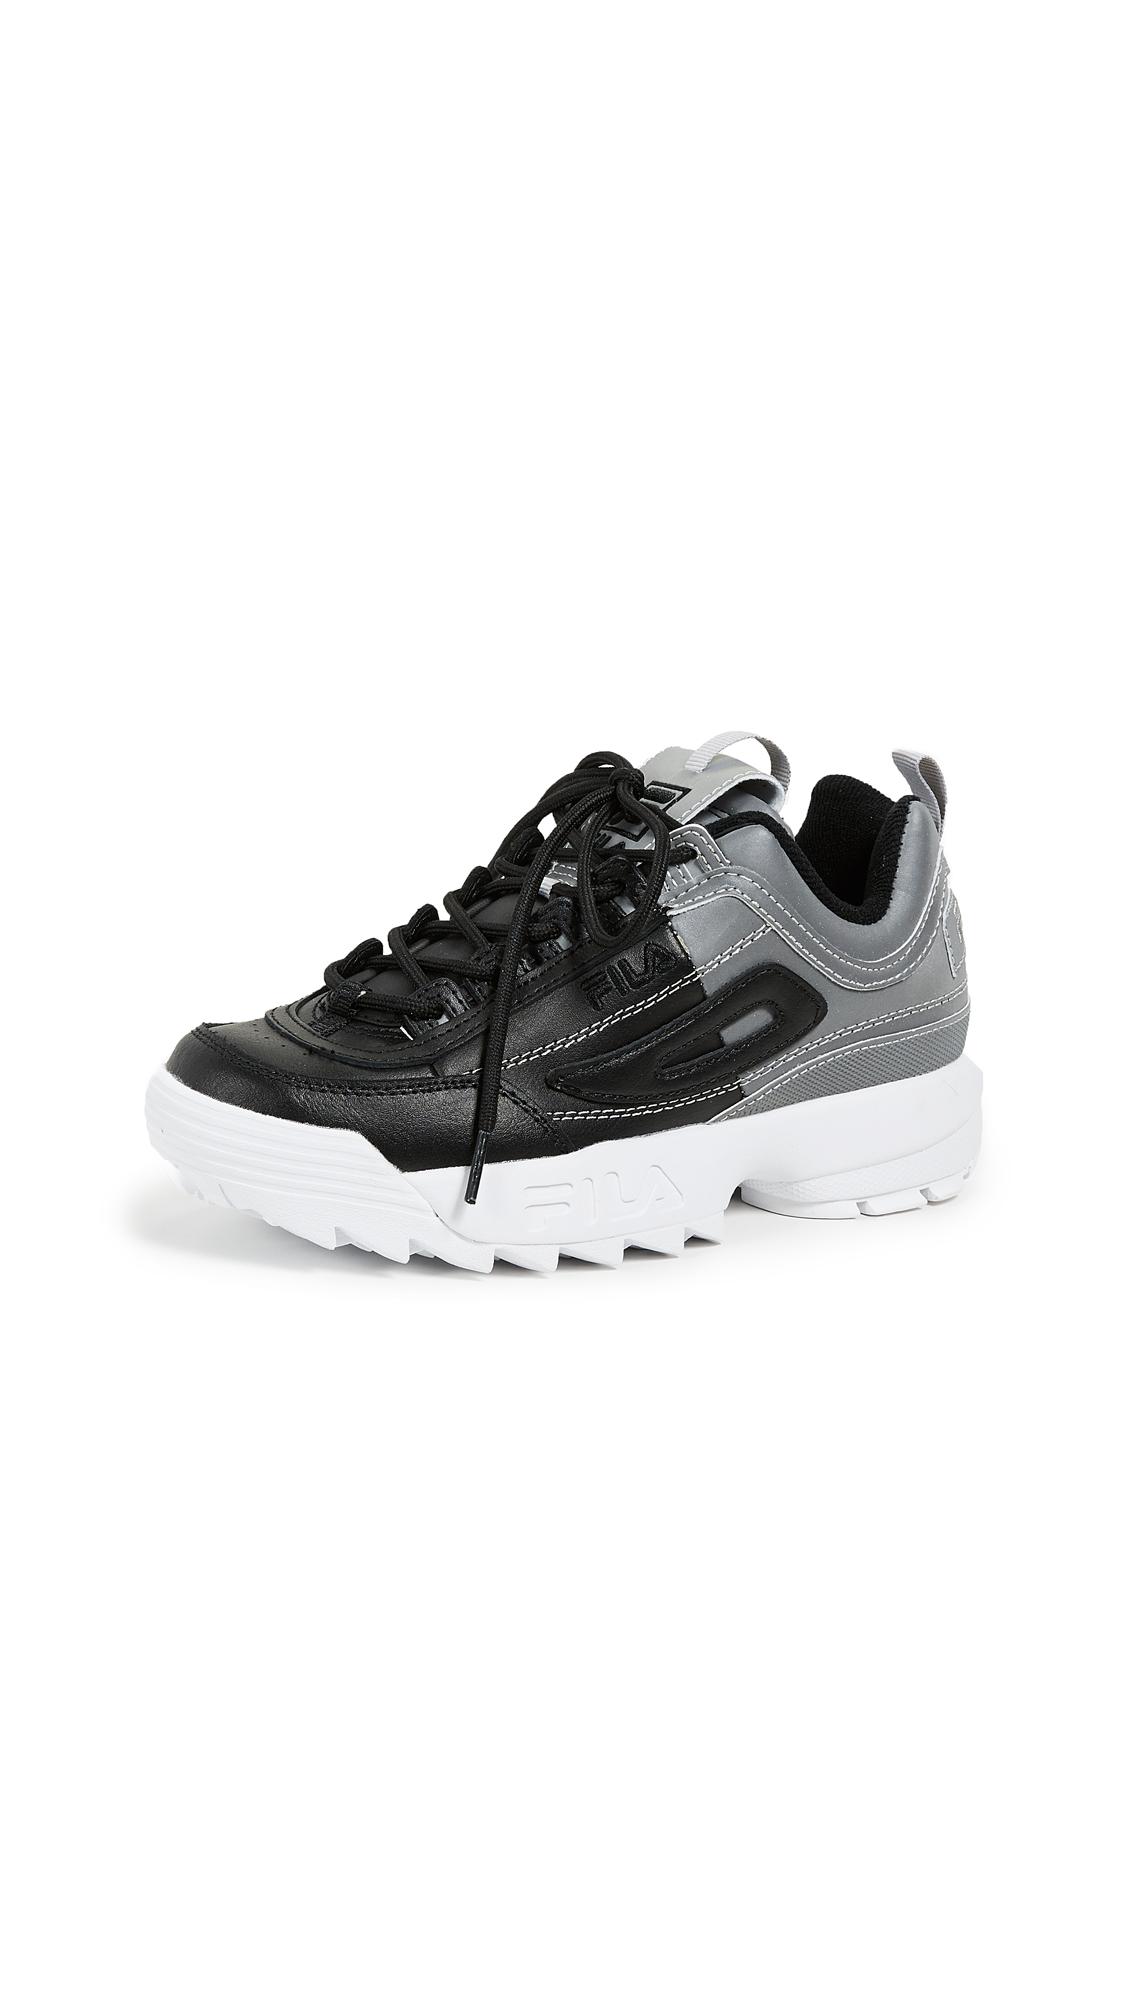 Fila Disruptor II Premium Sneakers - Black/Metallic Silver/White